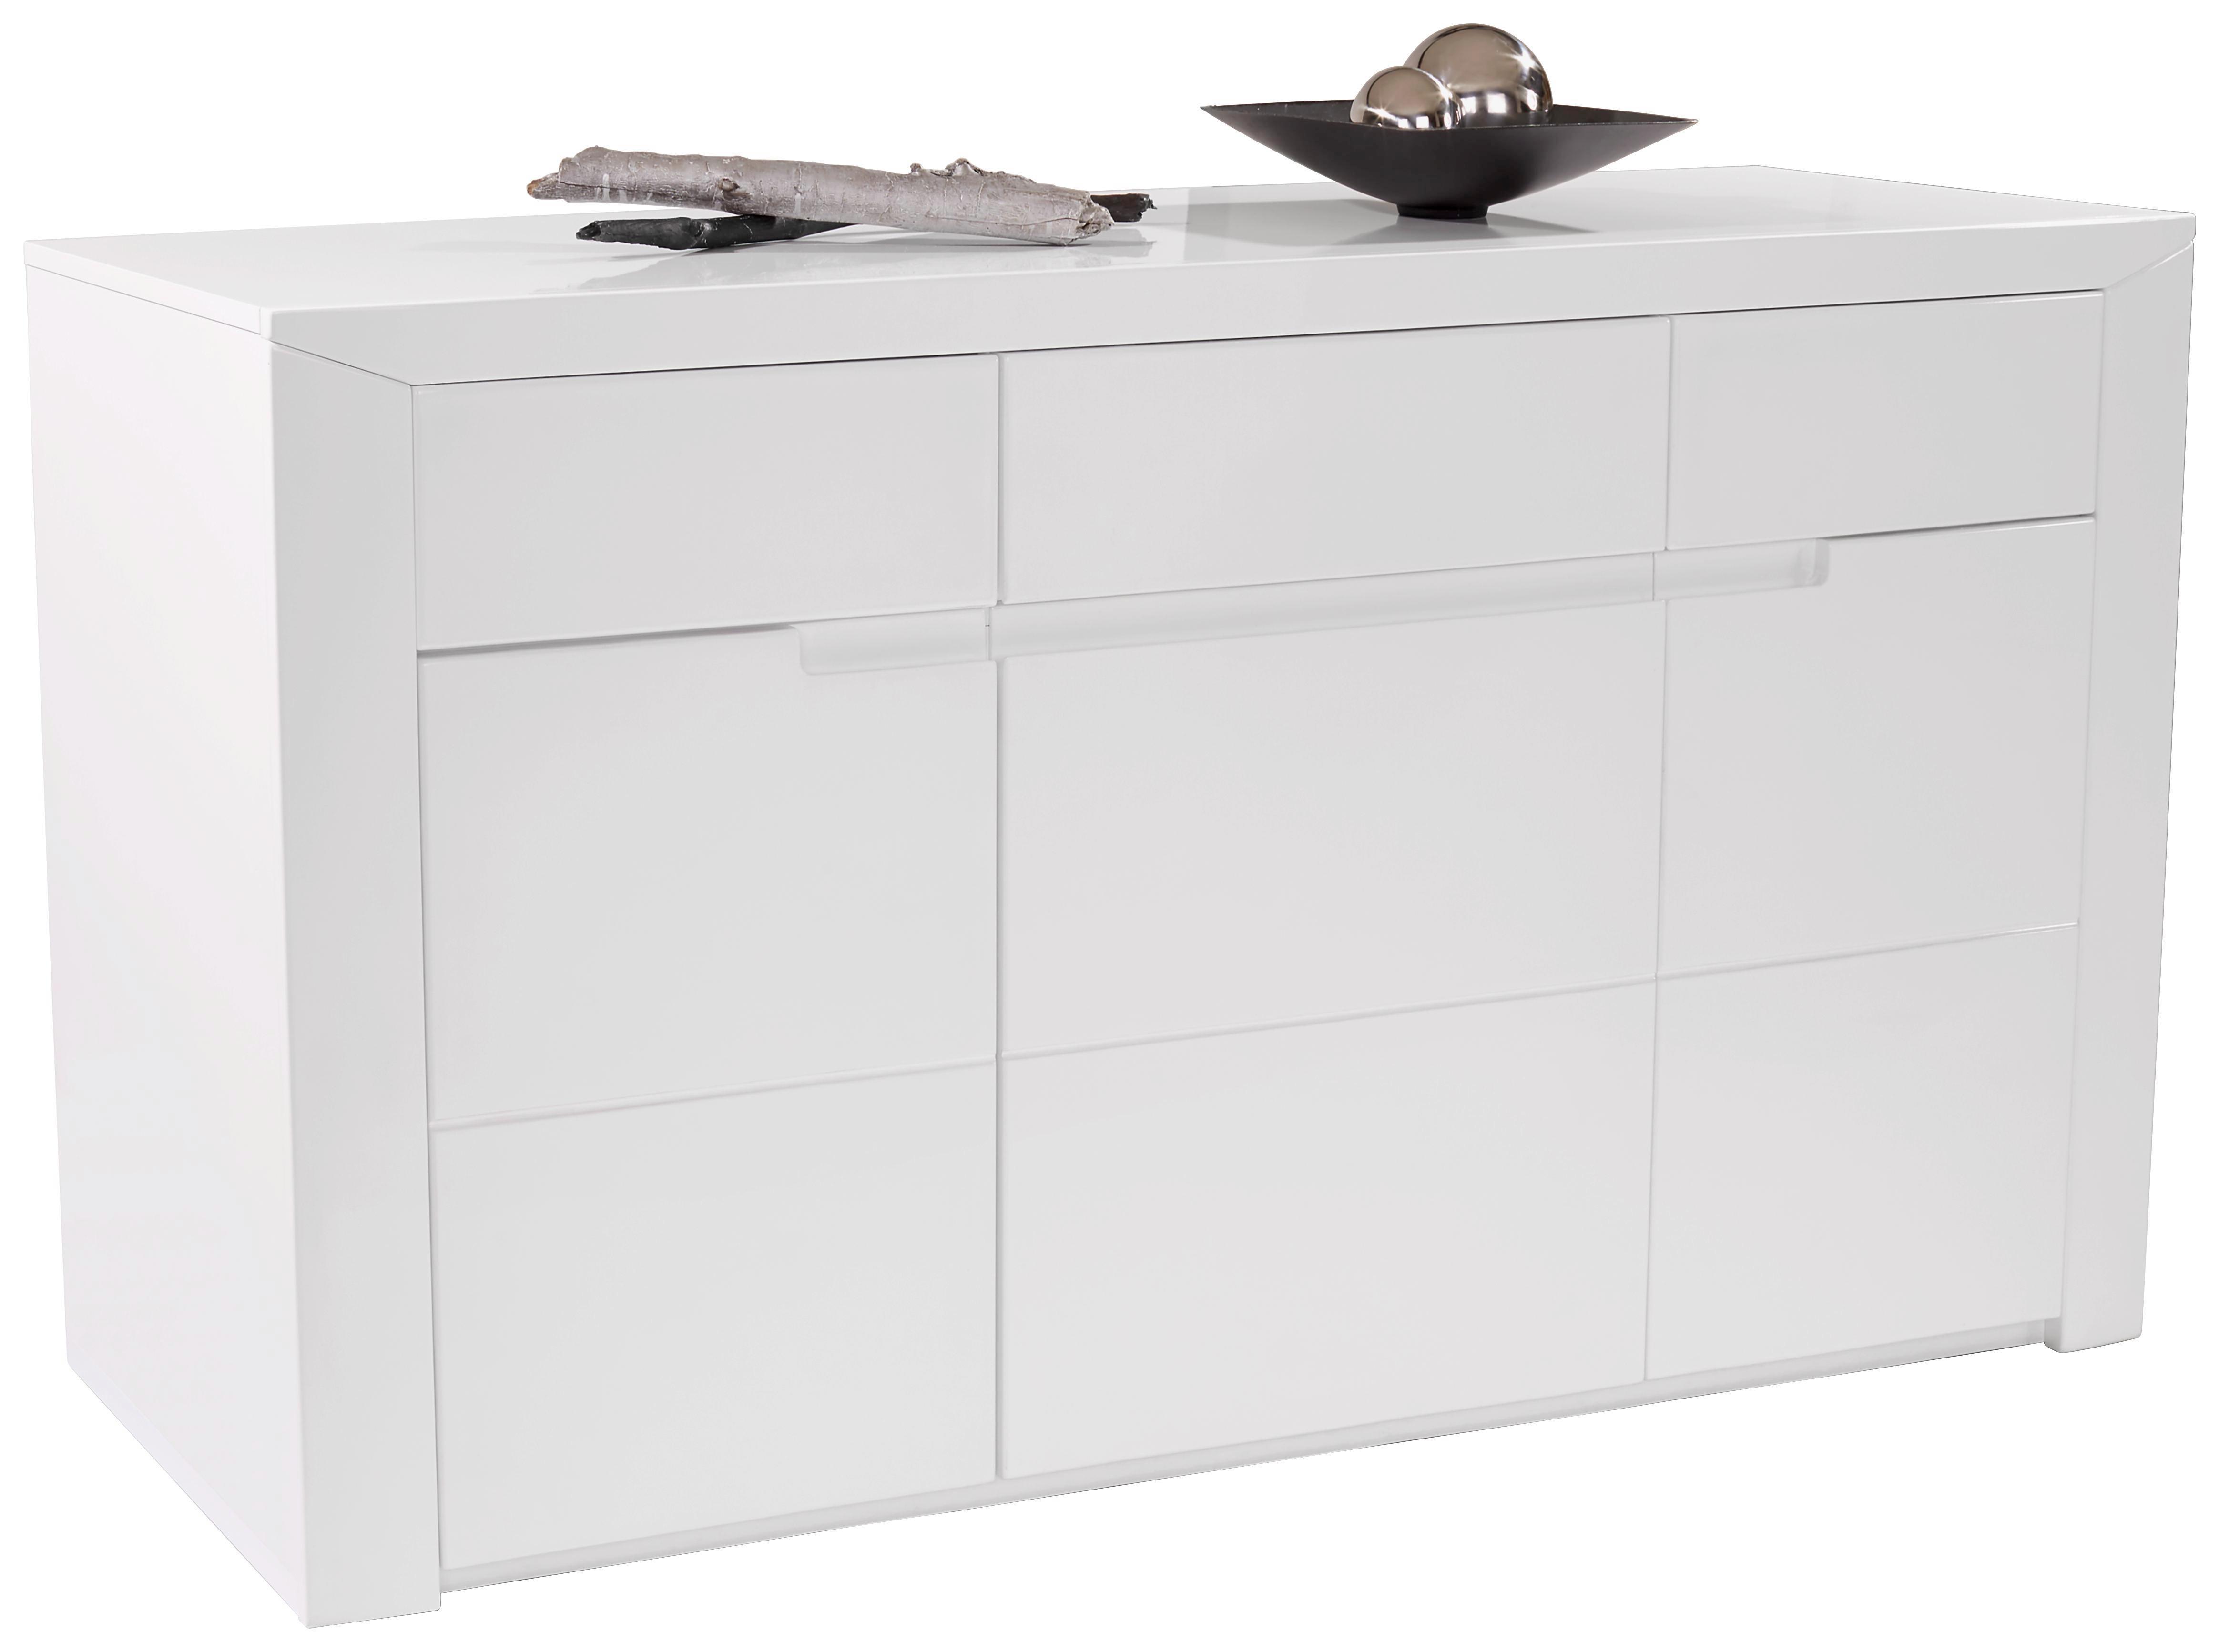 sideboard 25 cm tief finest sideboard dama anrichte kommode cm in wei hochglanz lackiert d. Black Bedroom Furniture Sets. Home Design Ideas